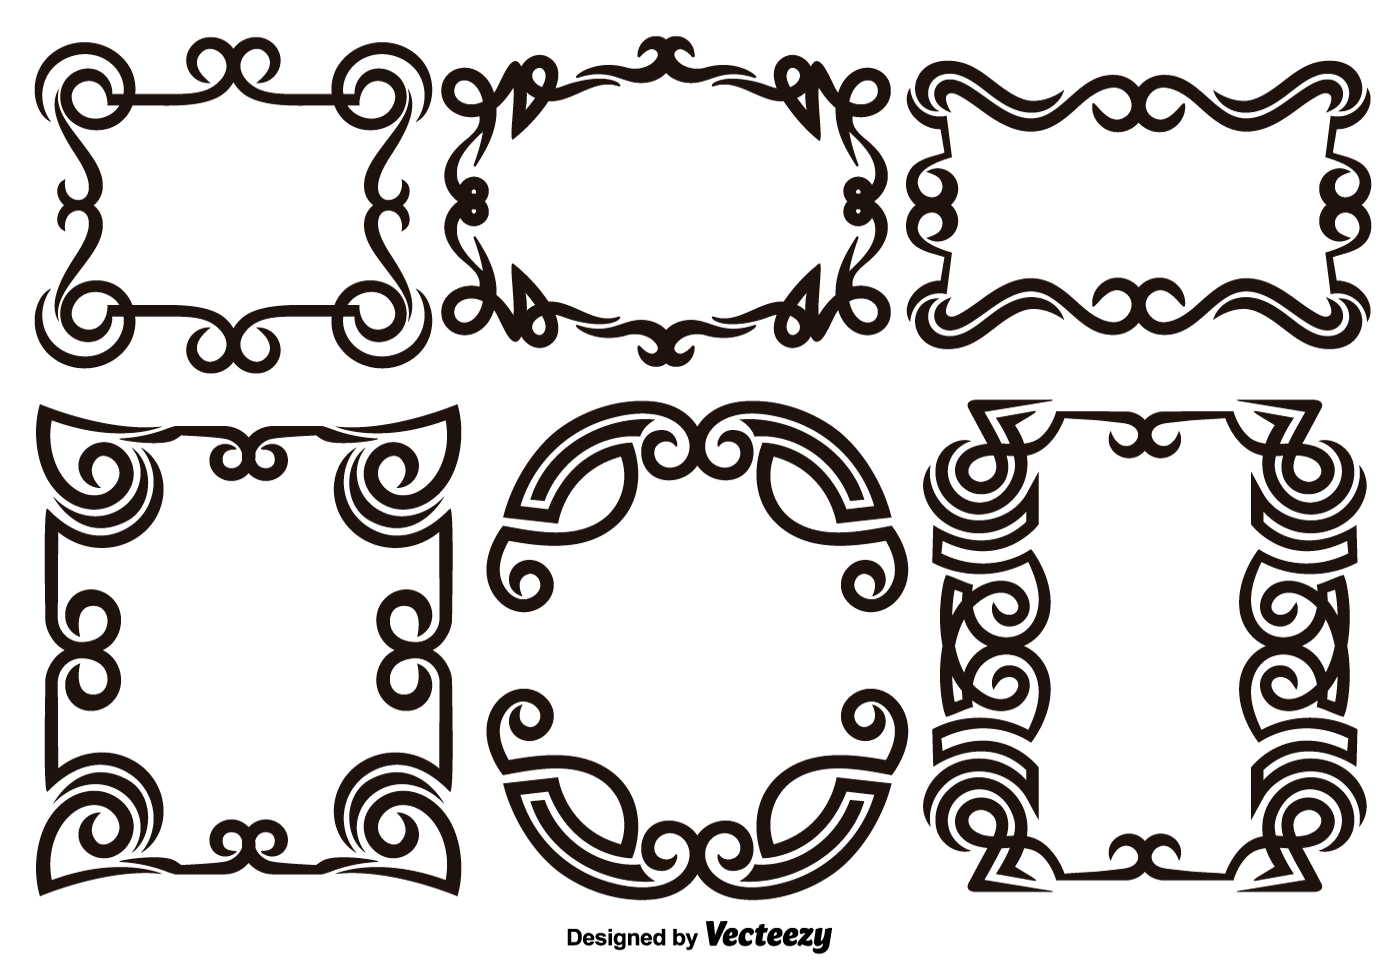 Scroll works design ornamental decorative frames for Decorative scrollwork